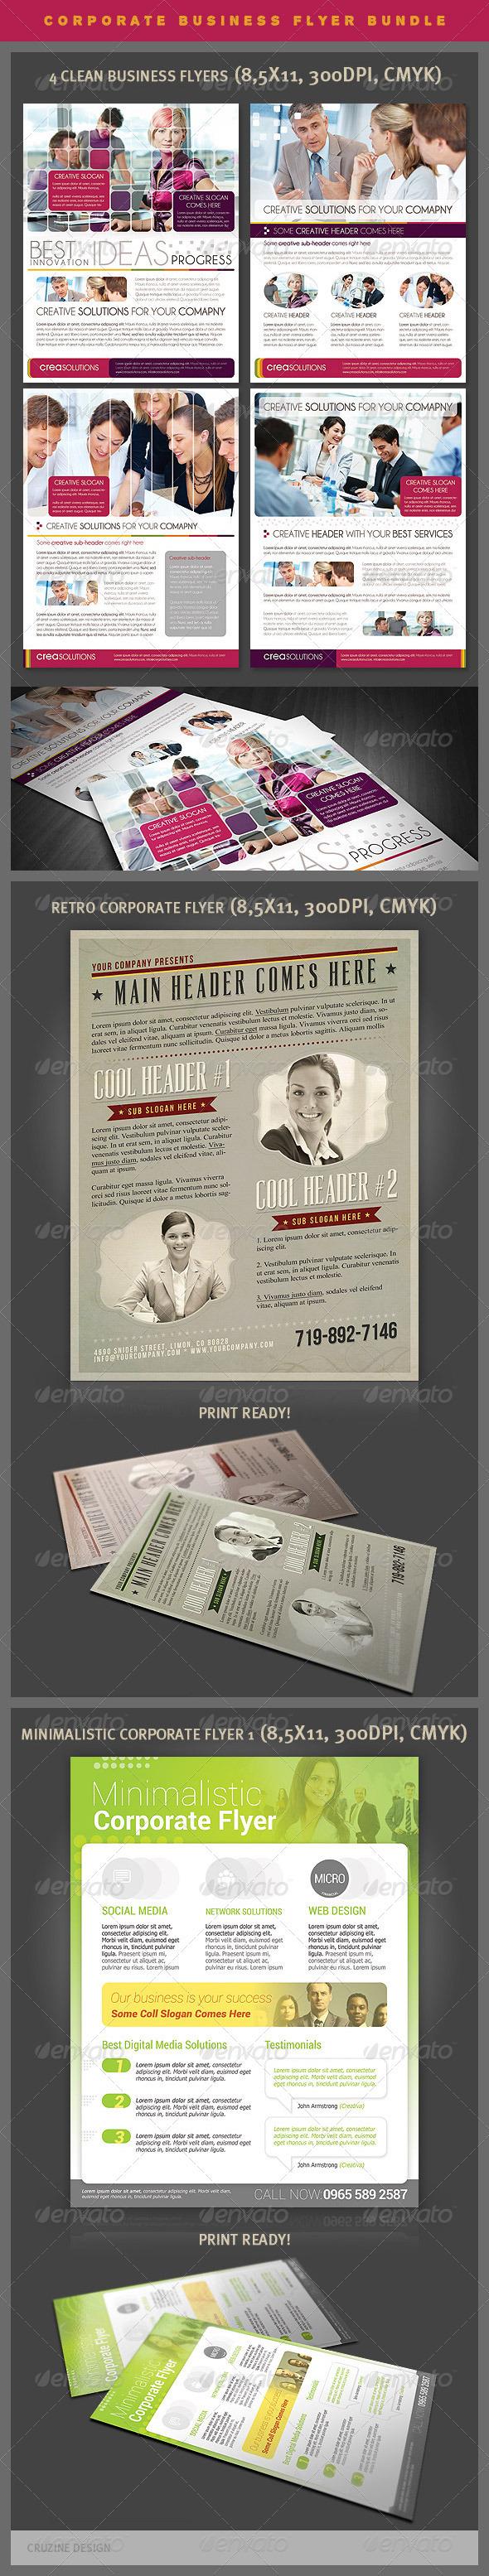 GraphicRiver Corporate Business Flyers Bundle 4009270